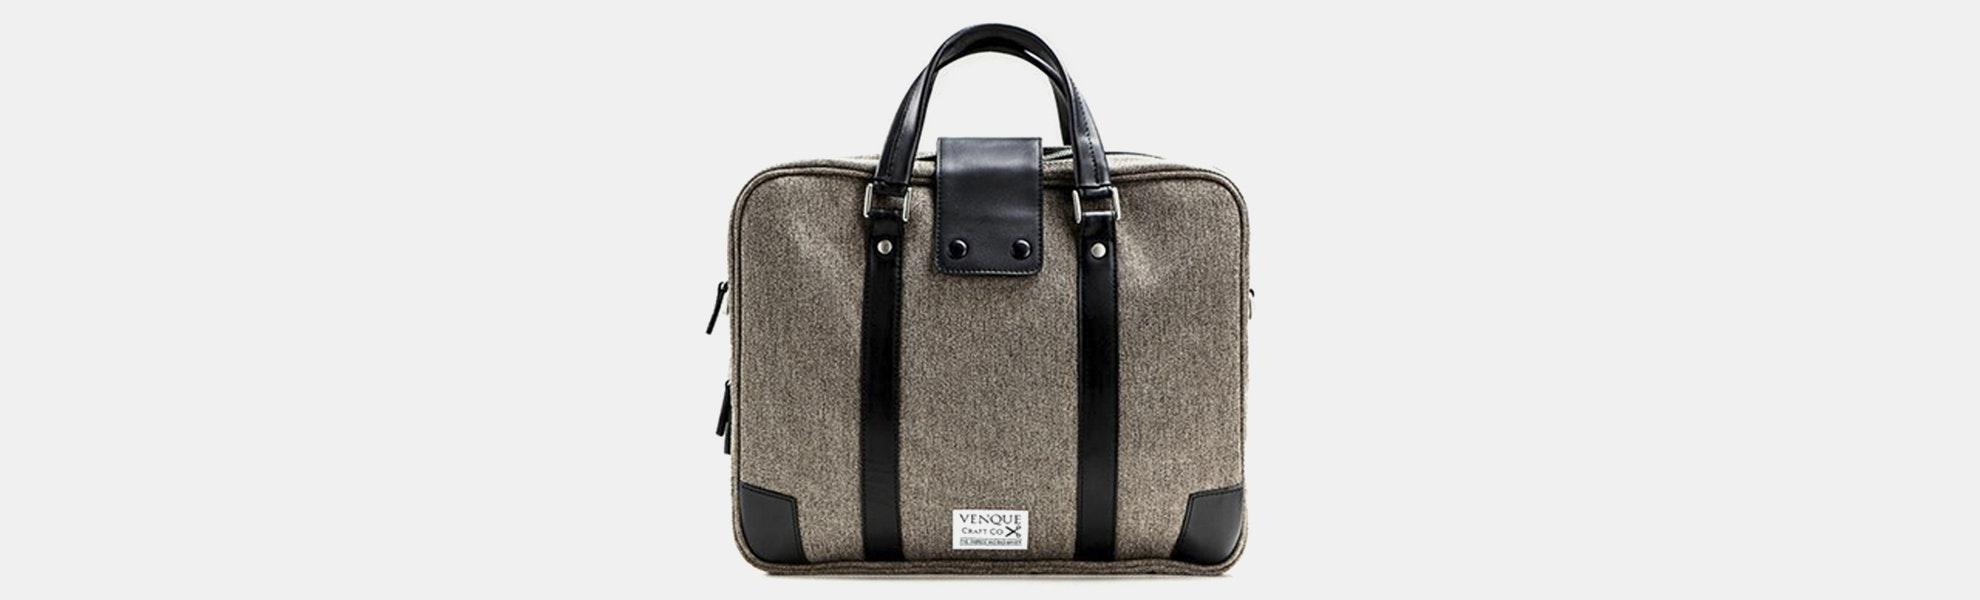 Venque Hamptons Briefcase